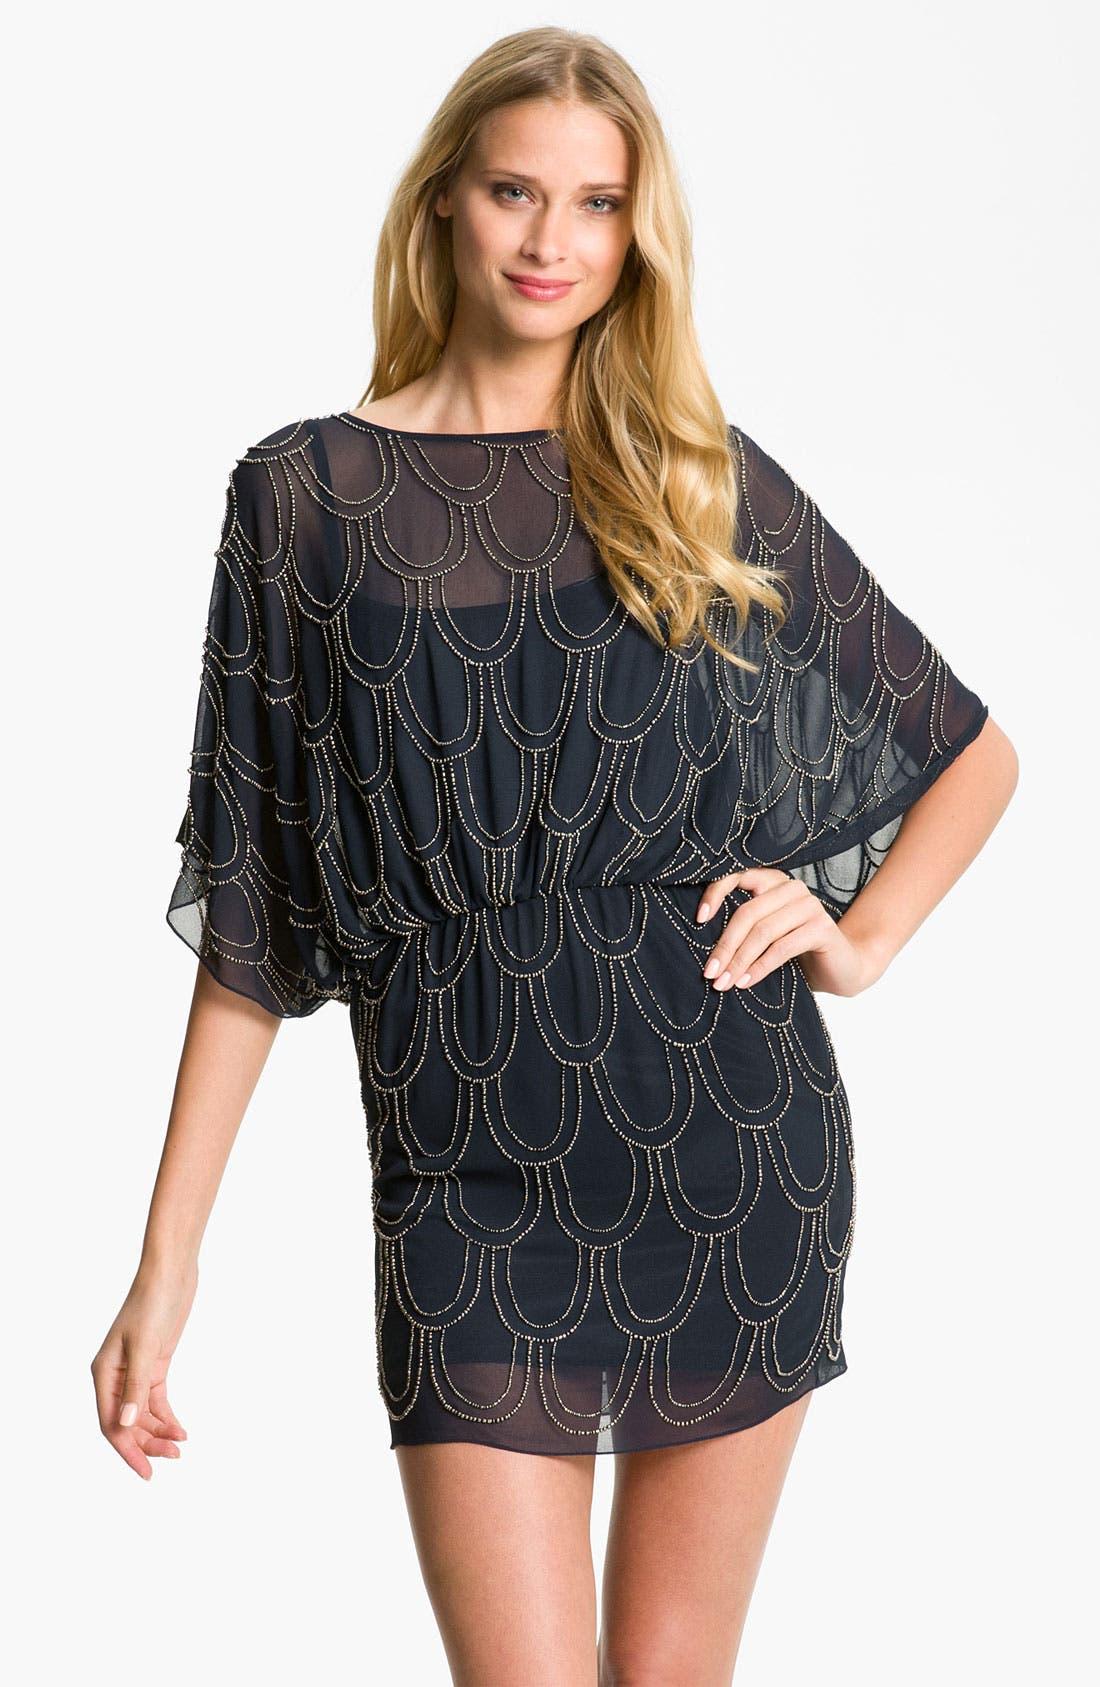 Alternate Image 1 Selected - JS Collections Beaded Chiffon Blouson Dress